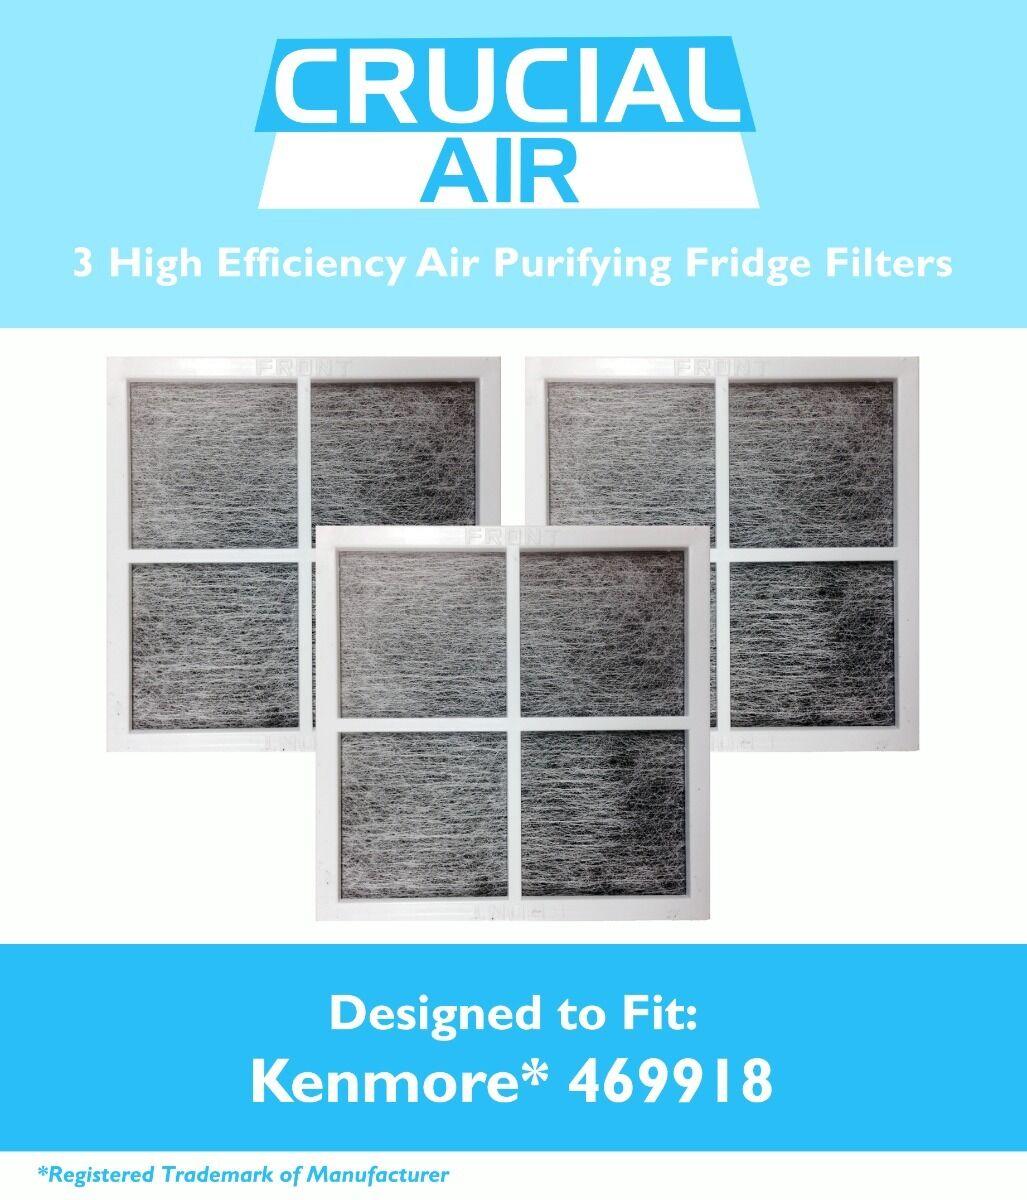 3 REPL Kenmore Elite 9918 Air Purifying Fridge Filters Part